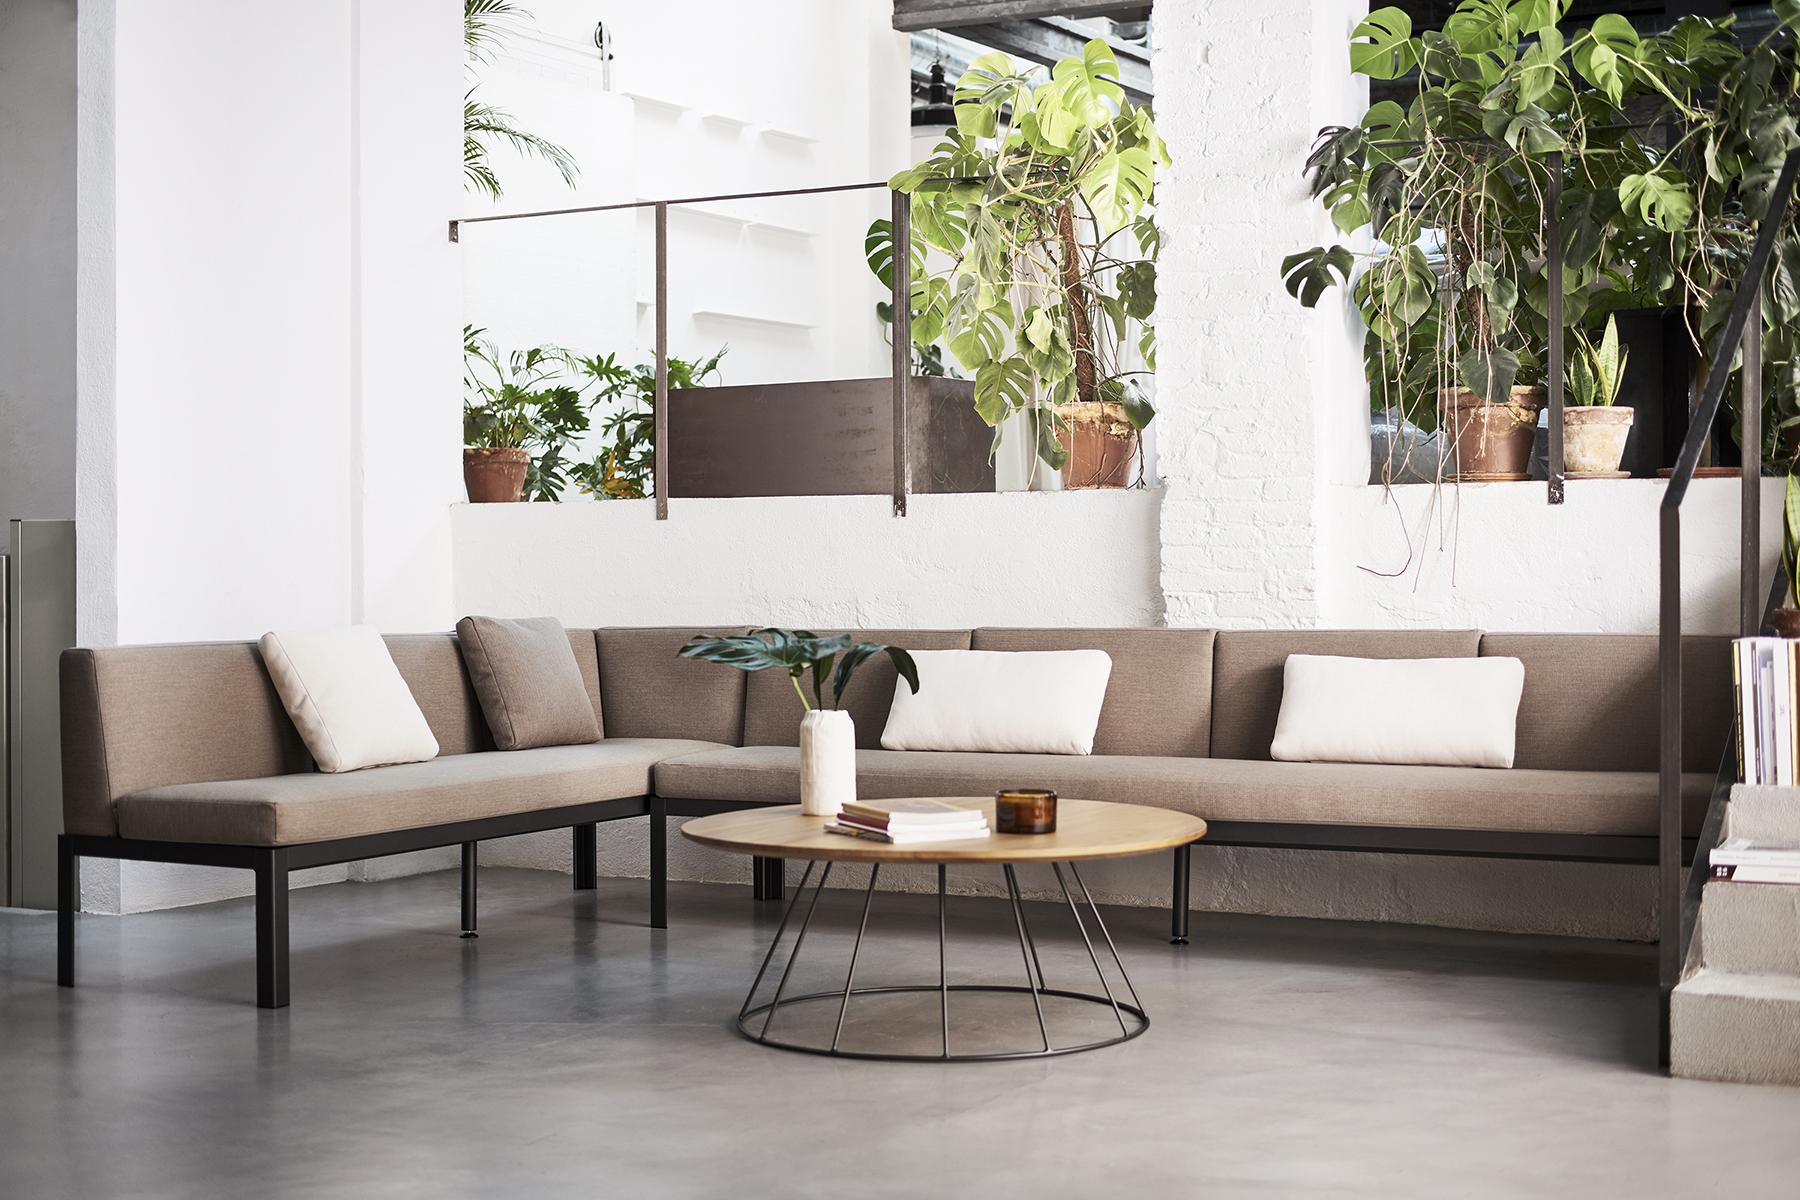 nak65 lounge sofa 15_088 copy